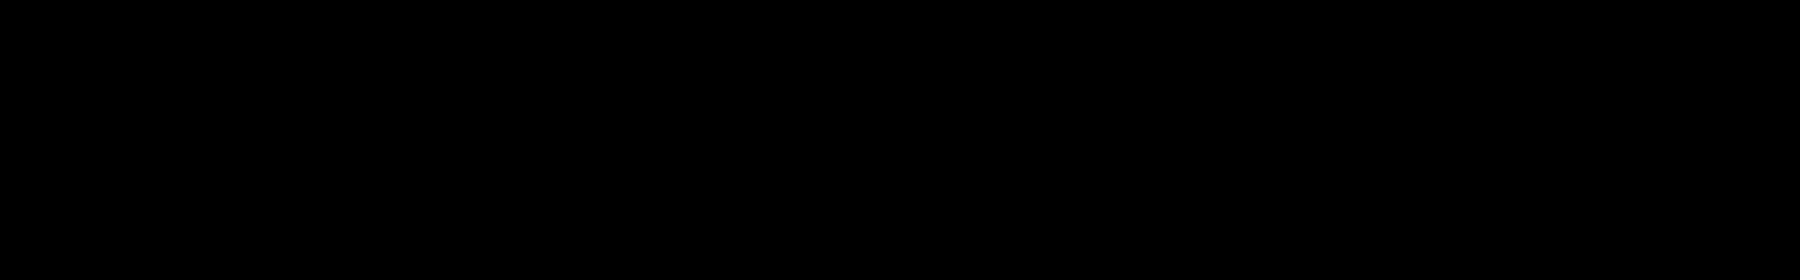 JL & Afterman:Nu Disco House 2 audio waveform